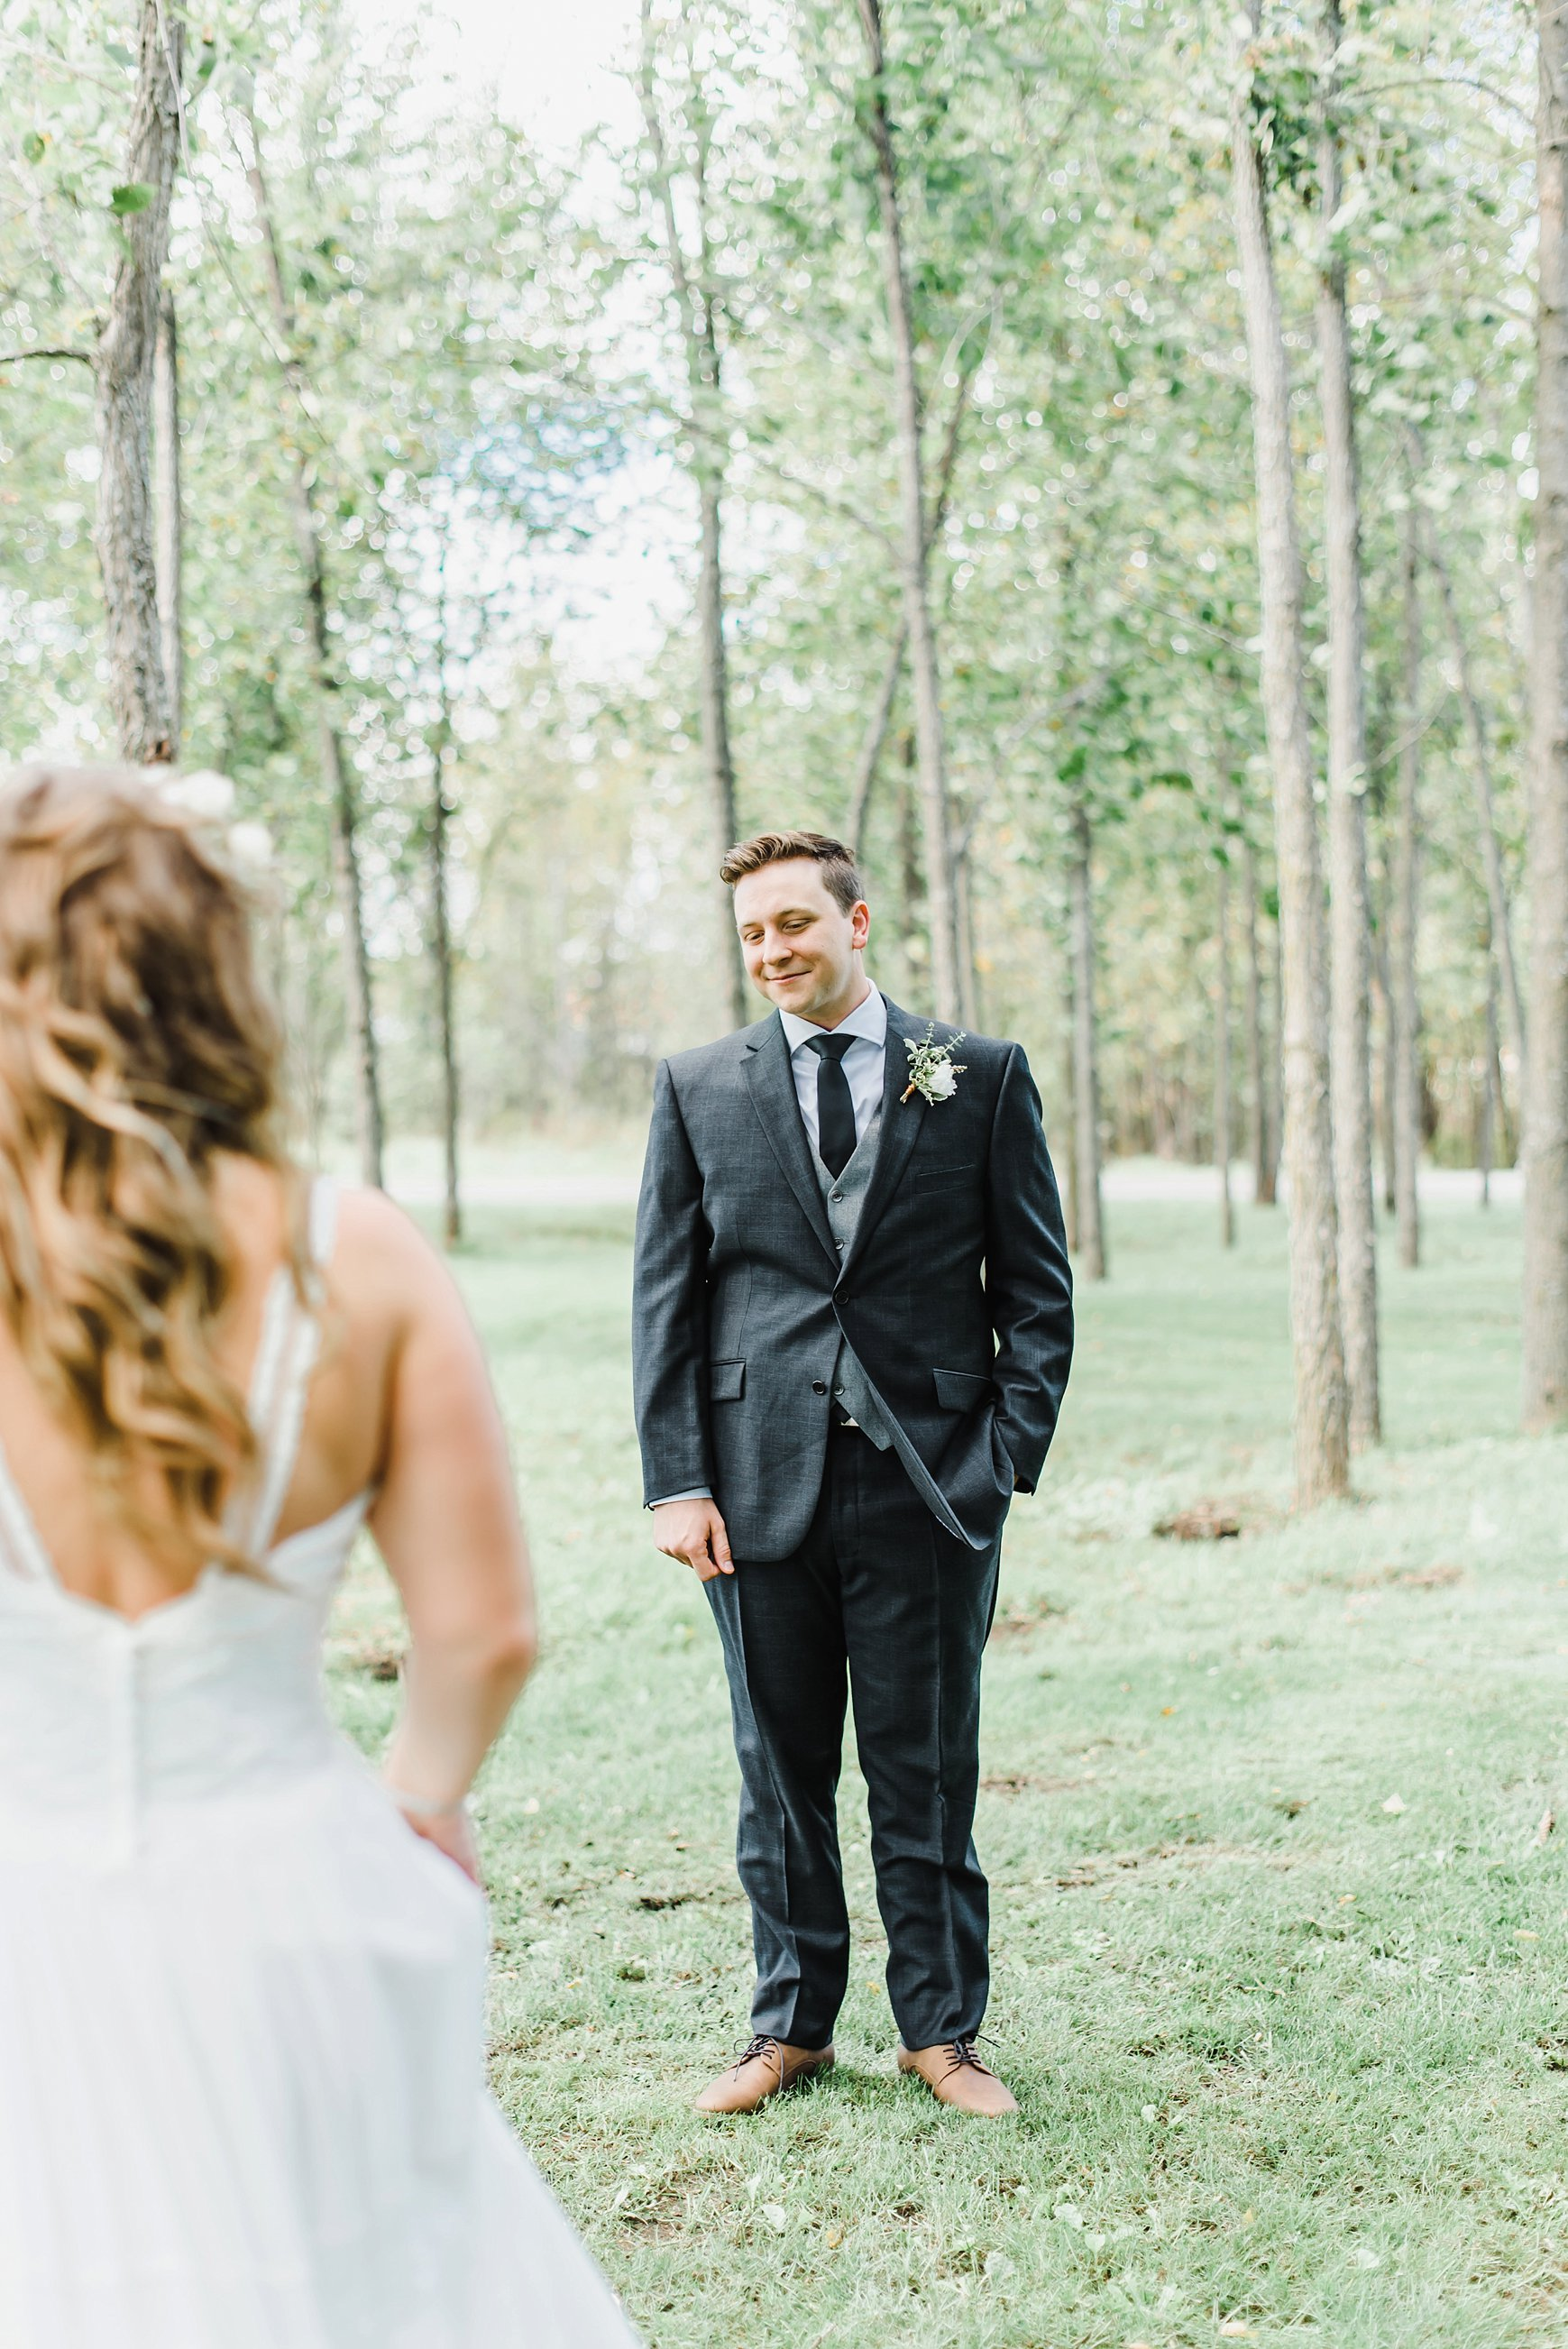 light airy indie fine art ottawa wedding photographer | Ali and Batoul Photography_1100.jpg